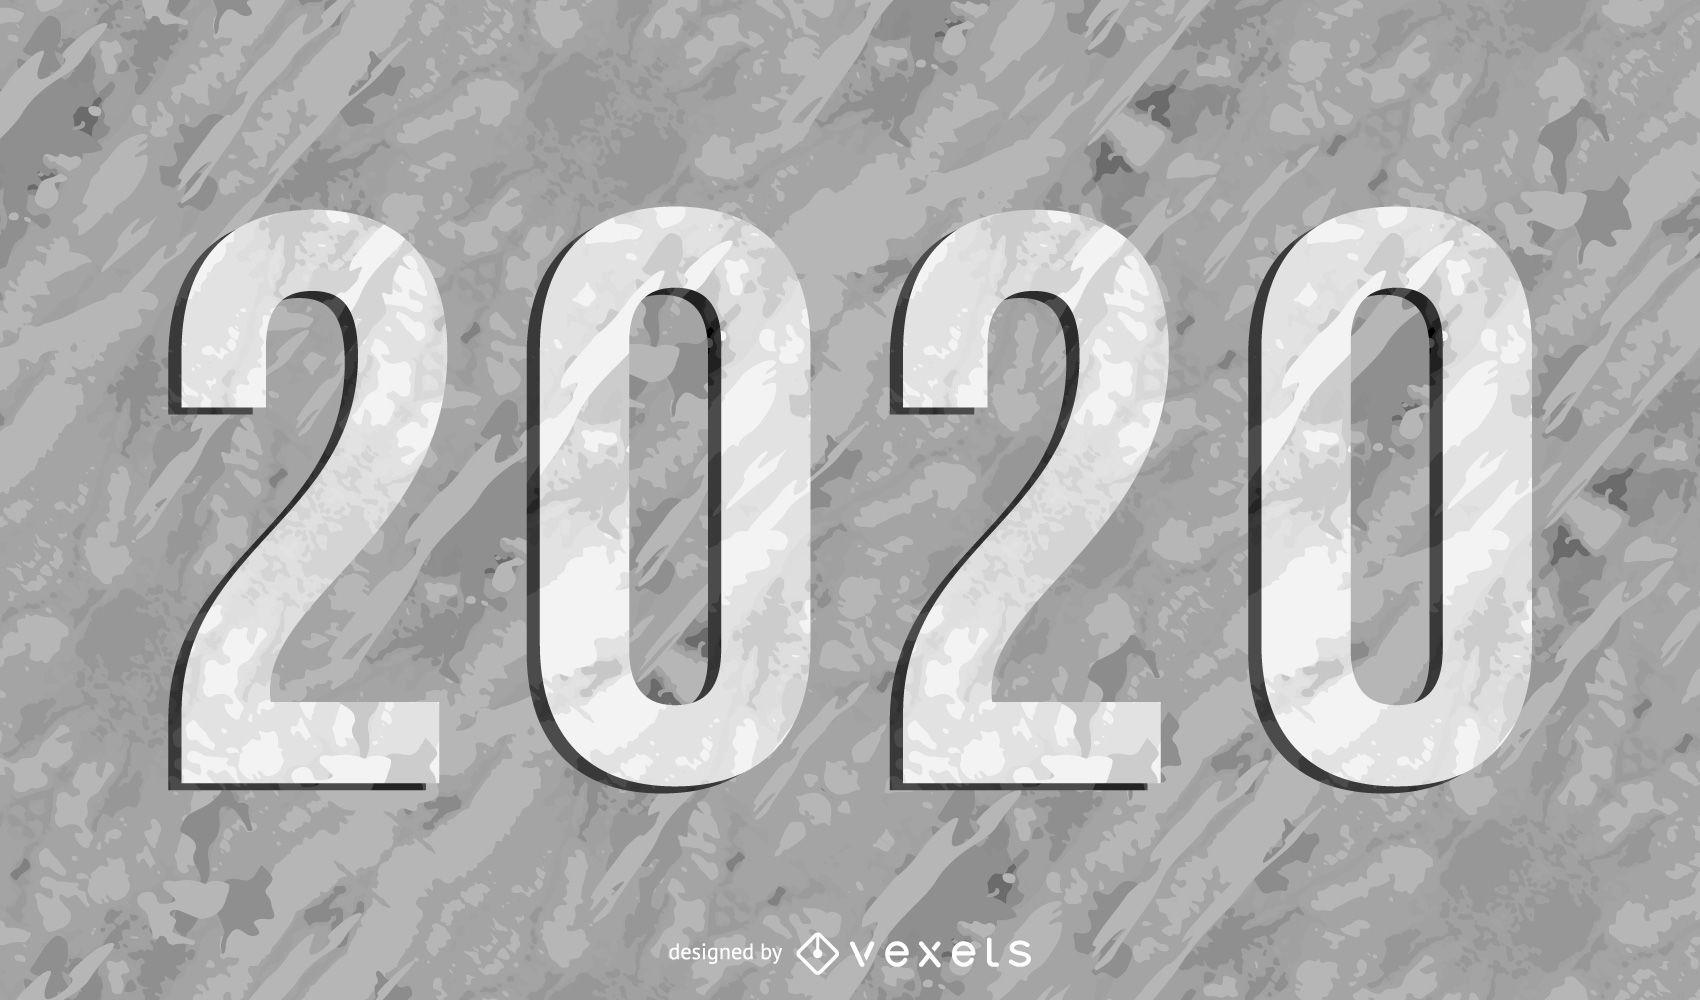 2015 textura sucio sobre fondo gris